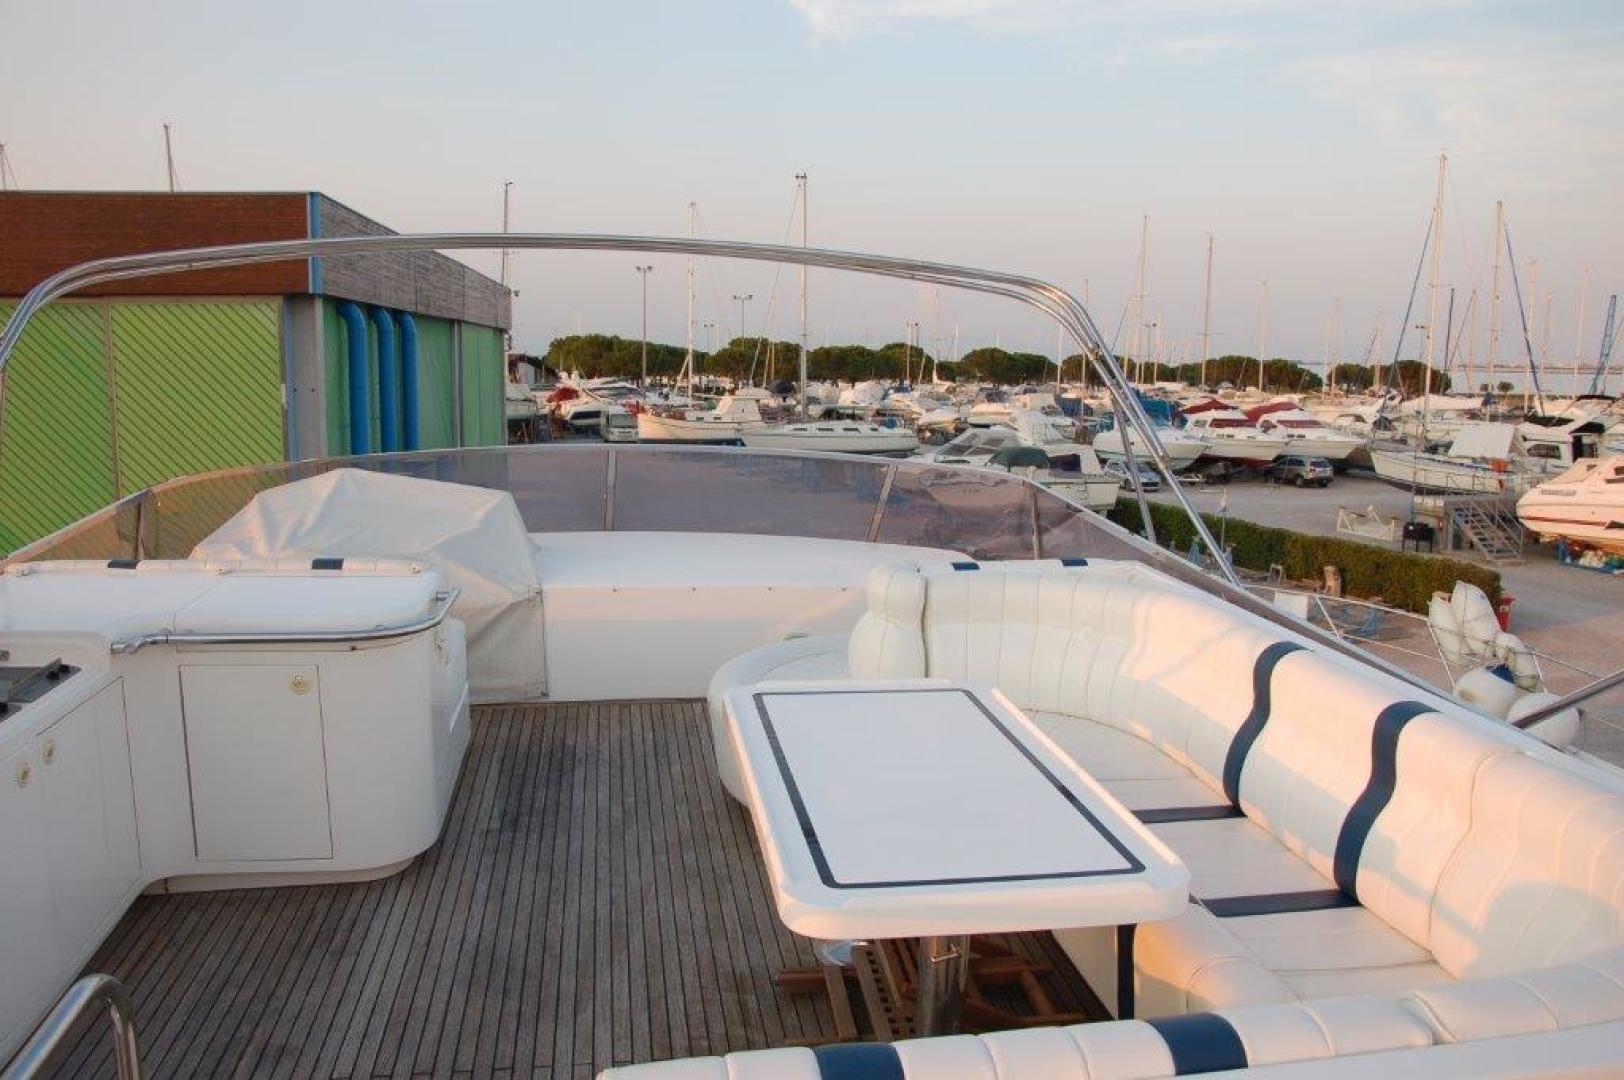 Elegance-70 Motor Yacht 1998 -Italy-1171276 | Thumbnail